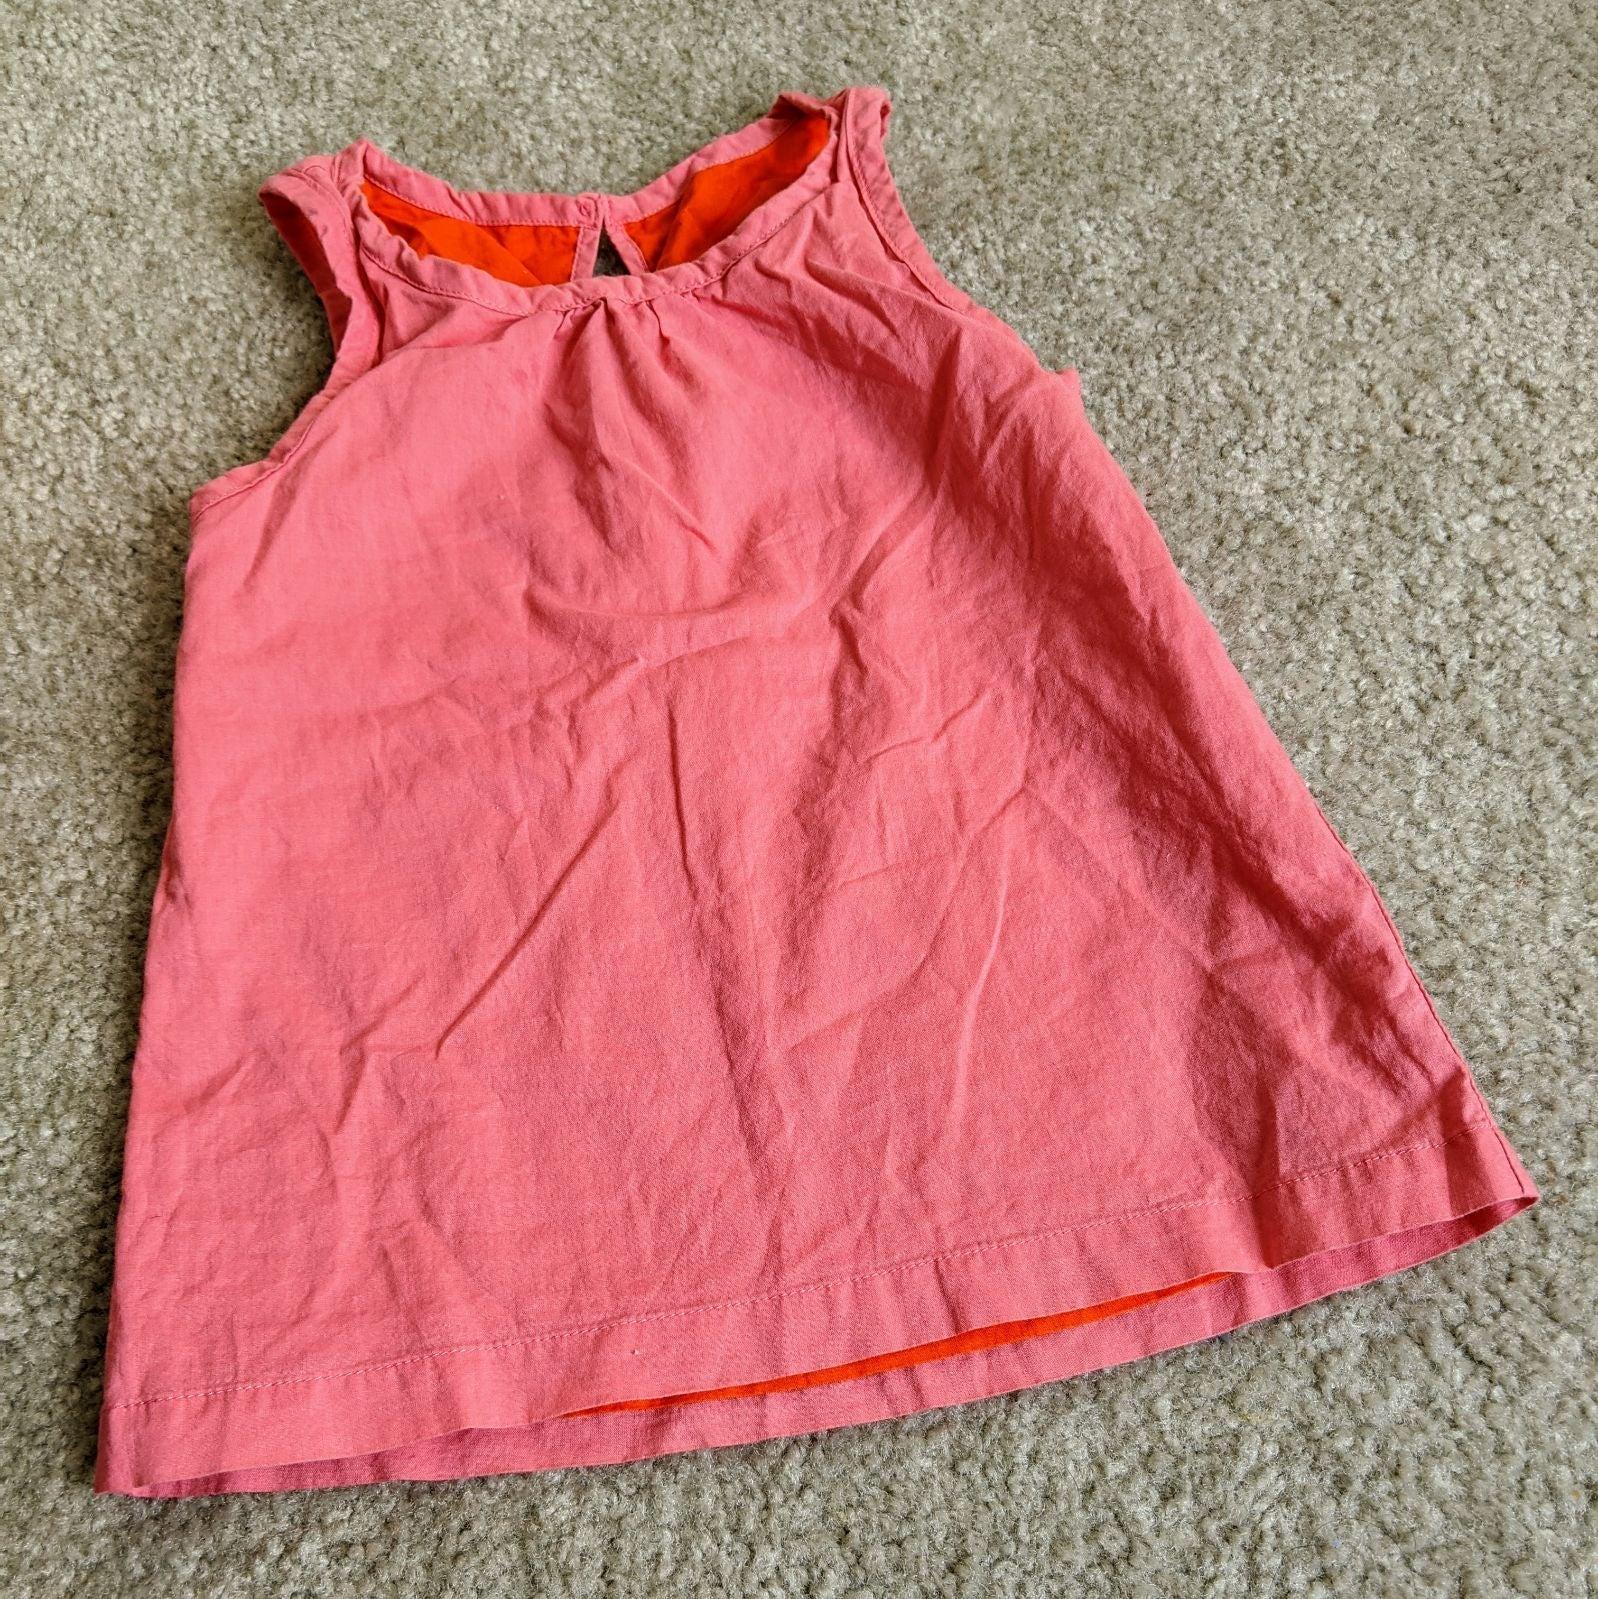 Primary cotton reversible top